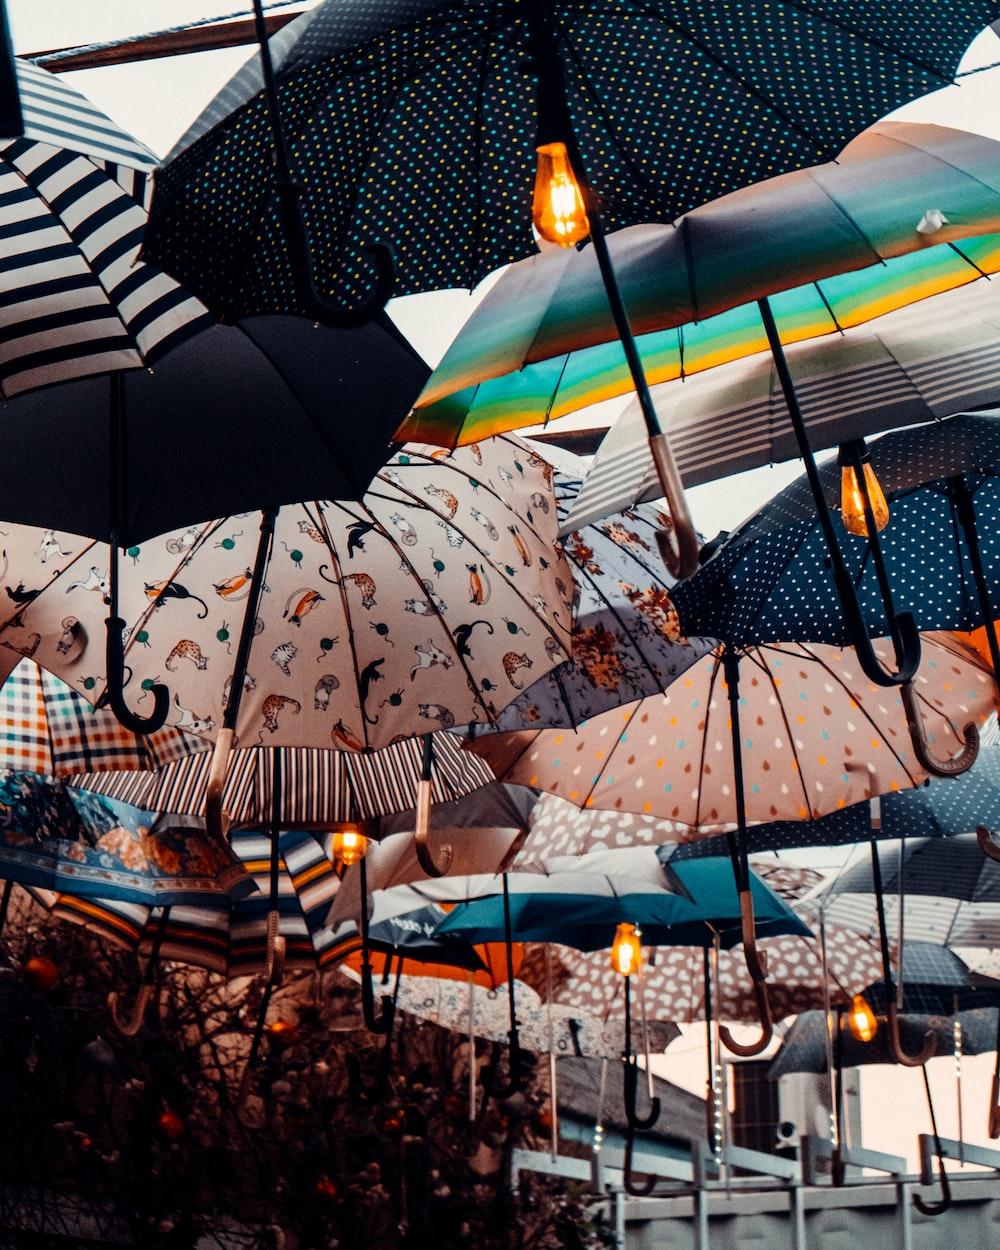 blue and white umbrella umbrella during daytime